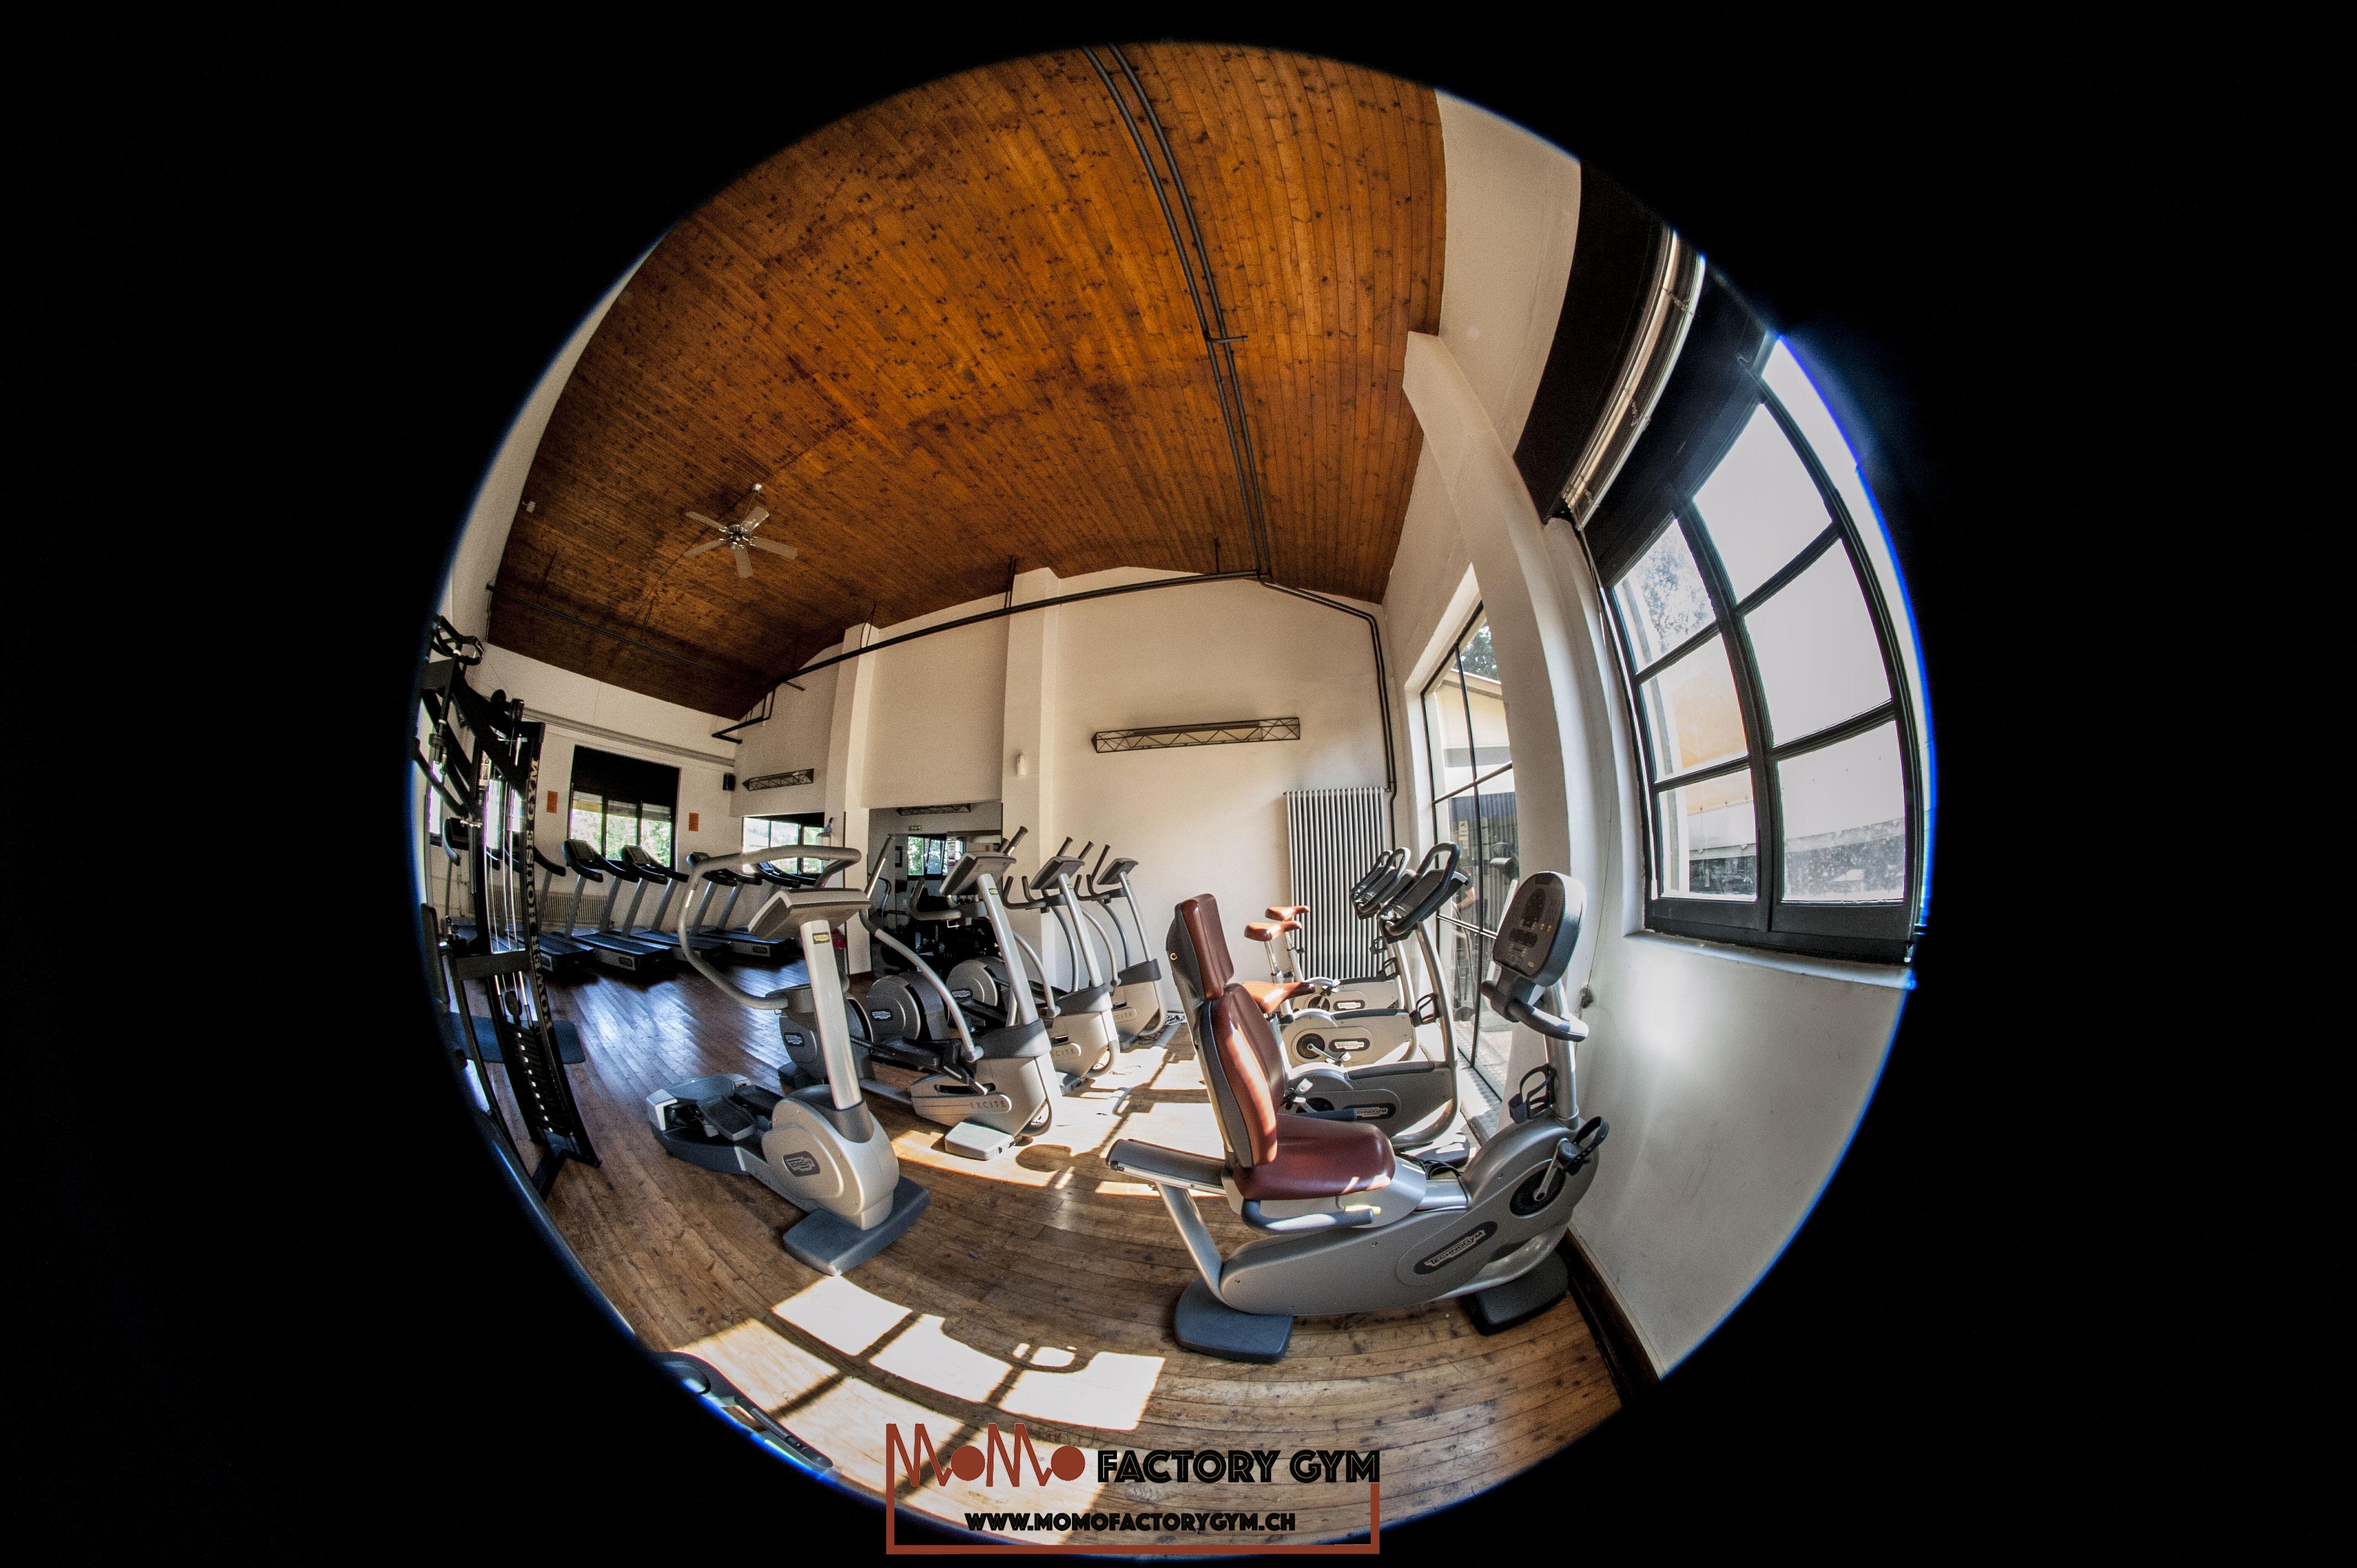 matrix_momo_factory_gym_sala_2